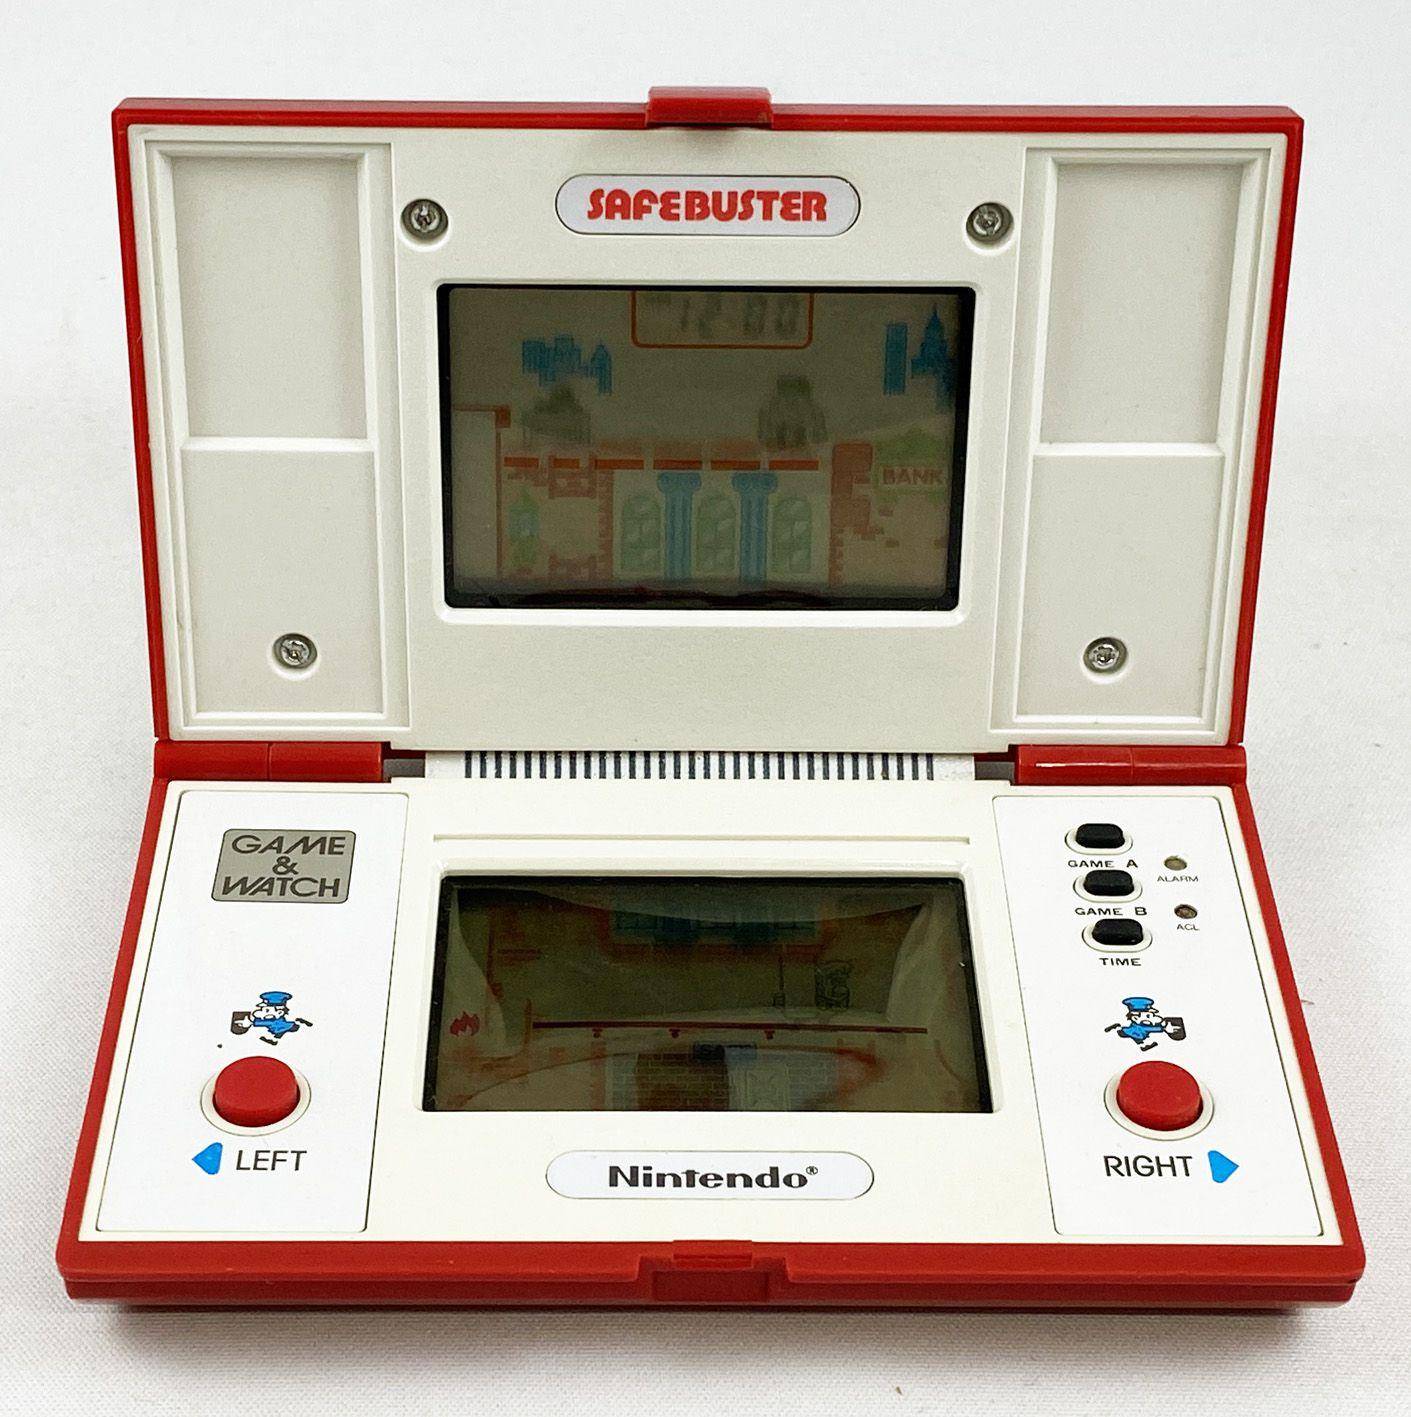 Nintendo Game & Watch - Multi Screen - Safebuster (JB-63) occasion sans boite